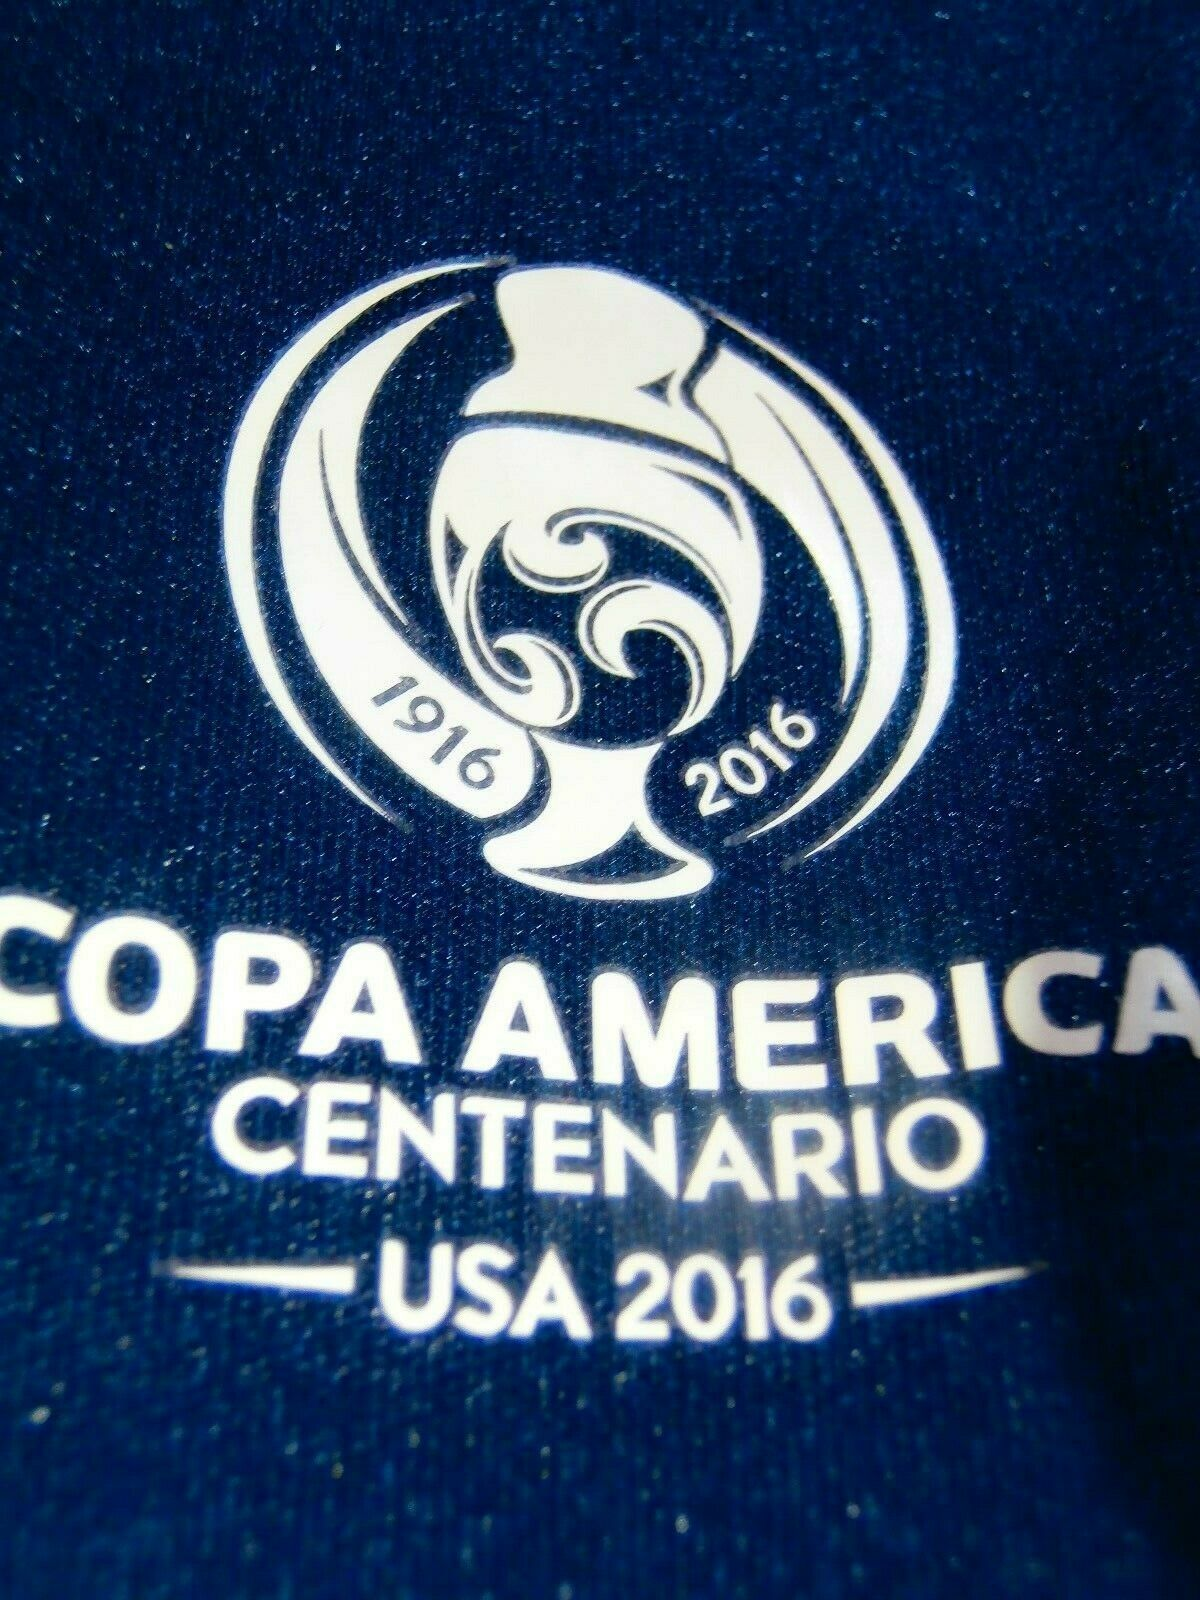 USA COPA AMERICA RARE 1916  2016 100 YEAR ANNI SOCCER FOOTBALL JERSEY TAG XL